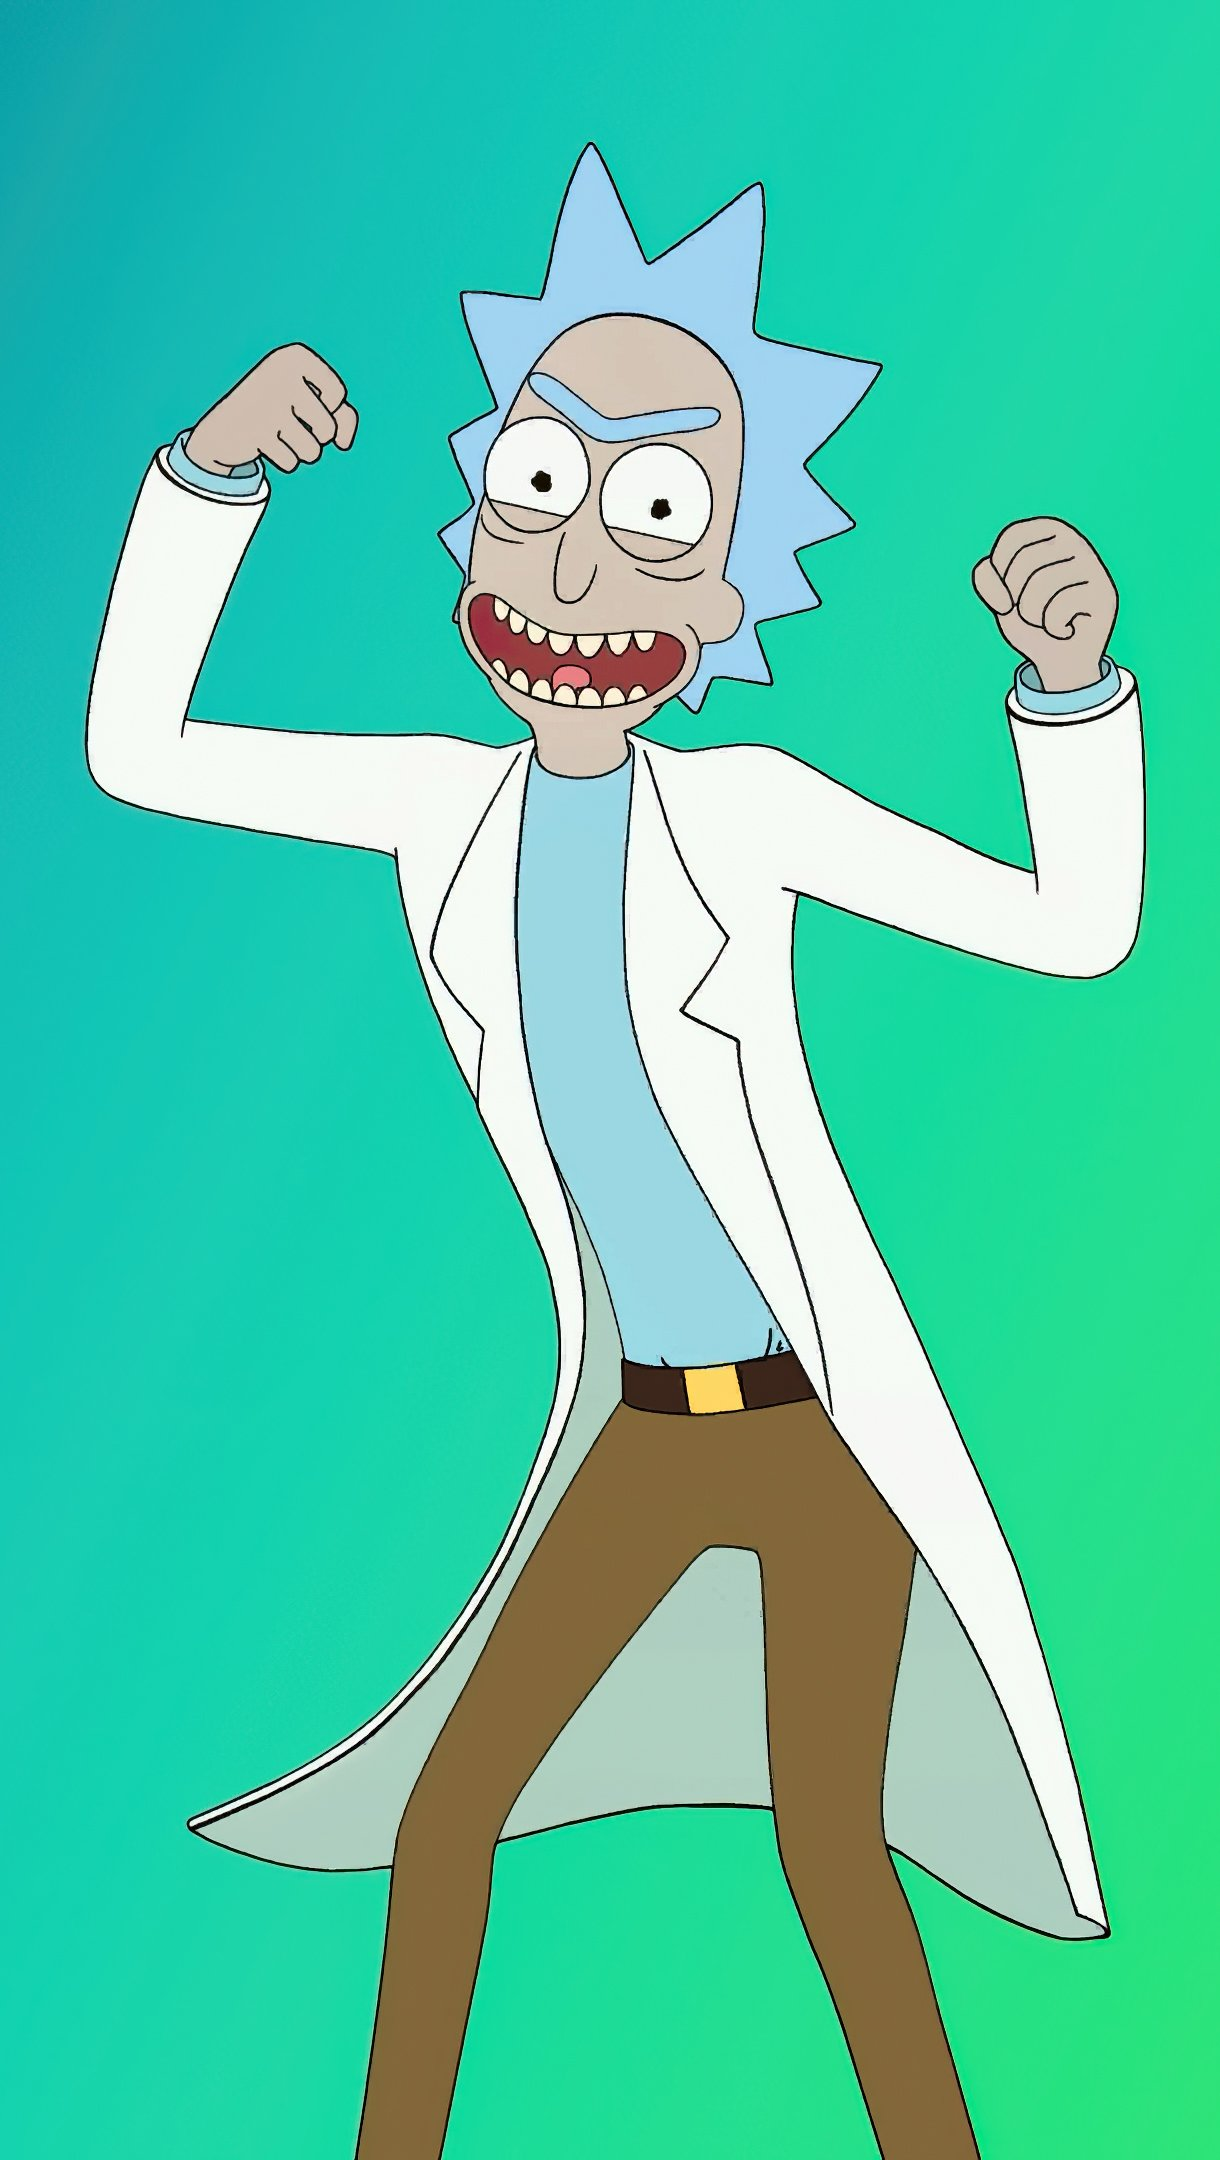 Wallpaper Rick and Morty dancing Vertical